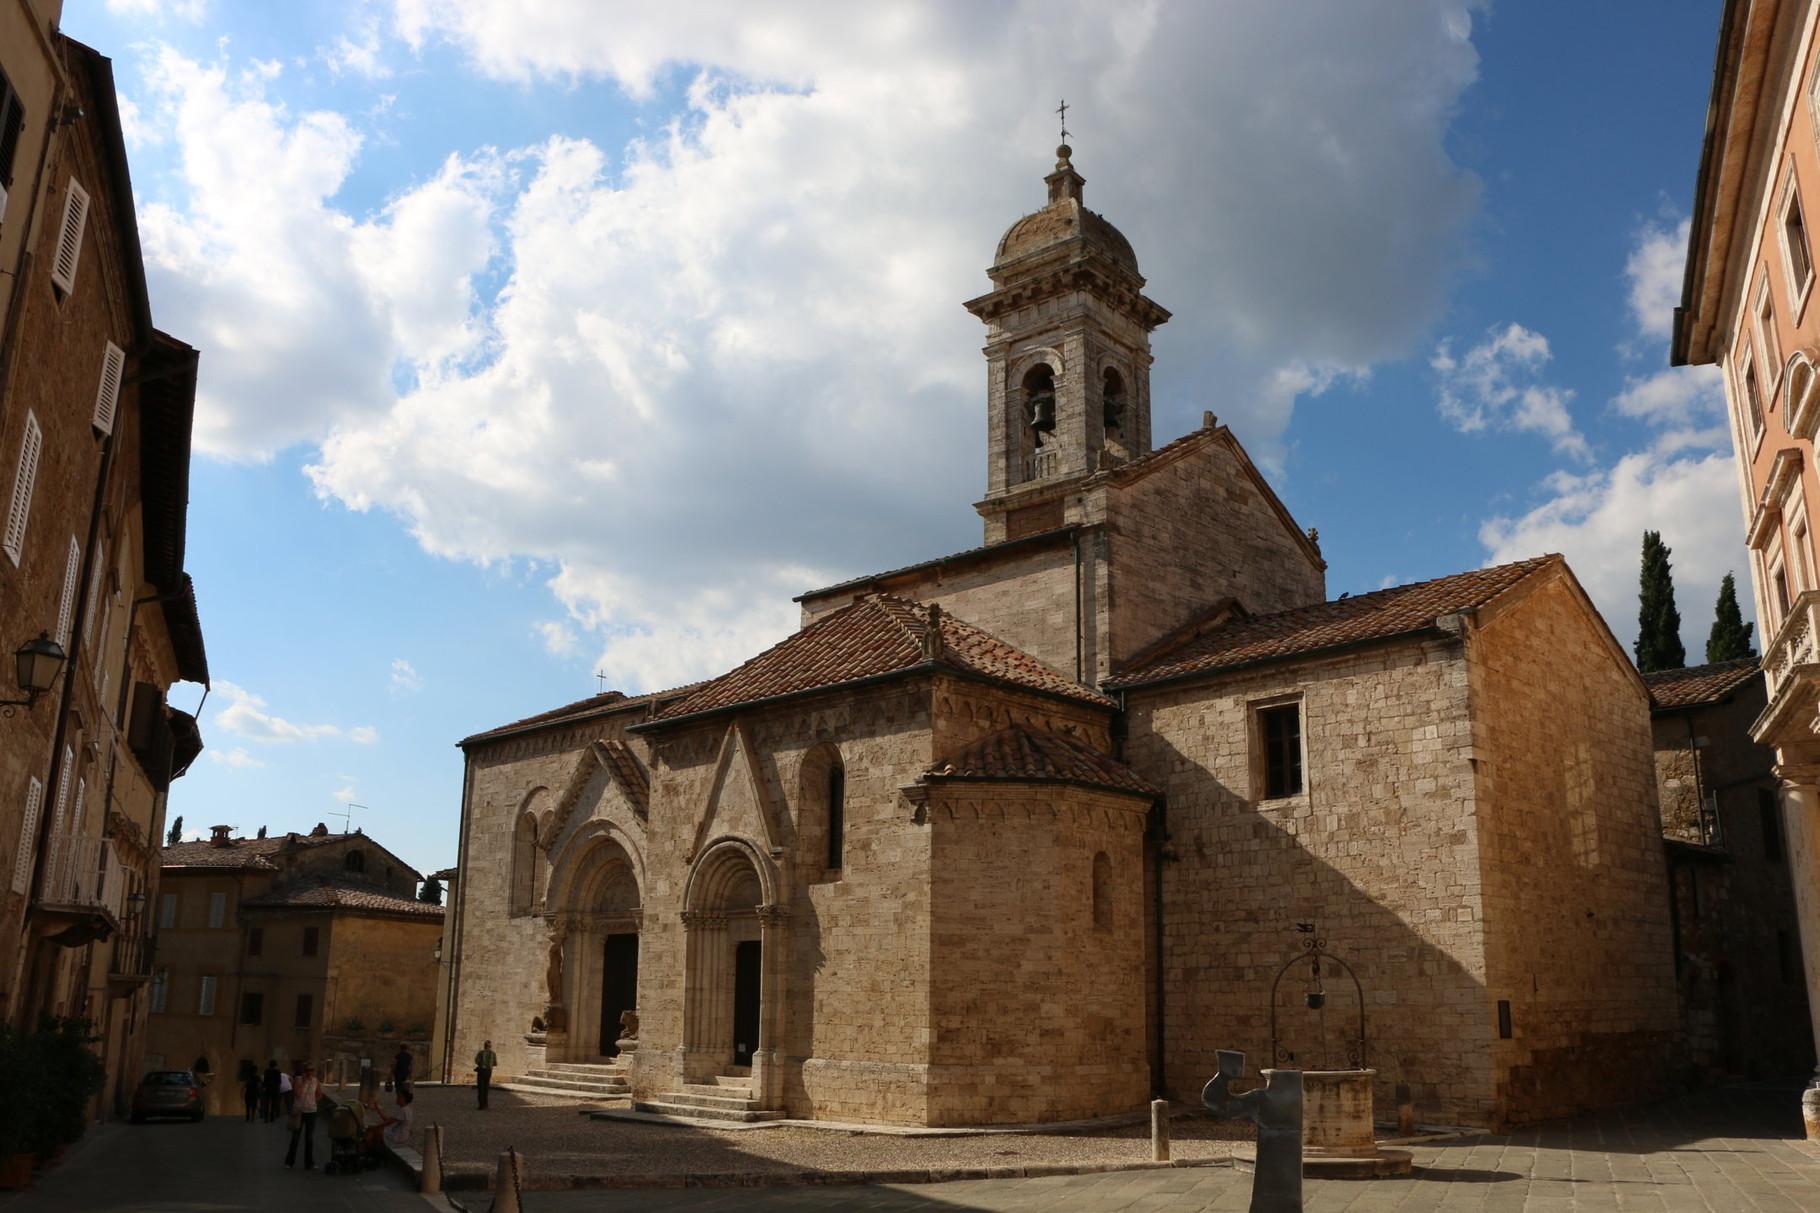 Tappa 35: San Quirico d'Orcia - Radicofani | 32,2 km